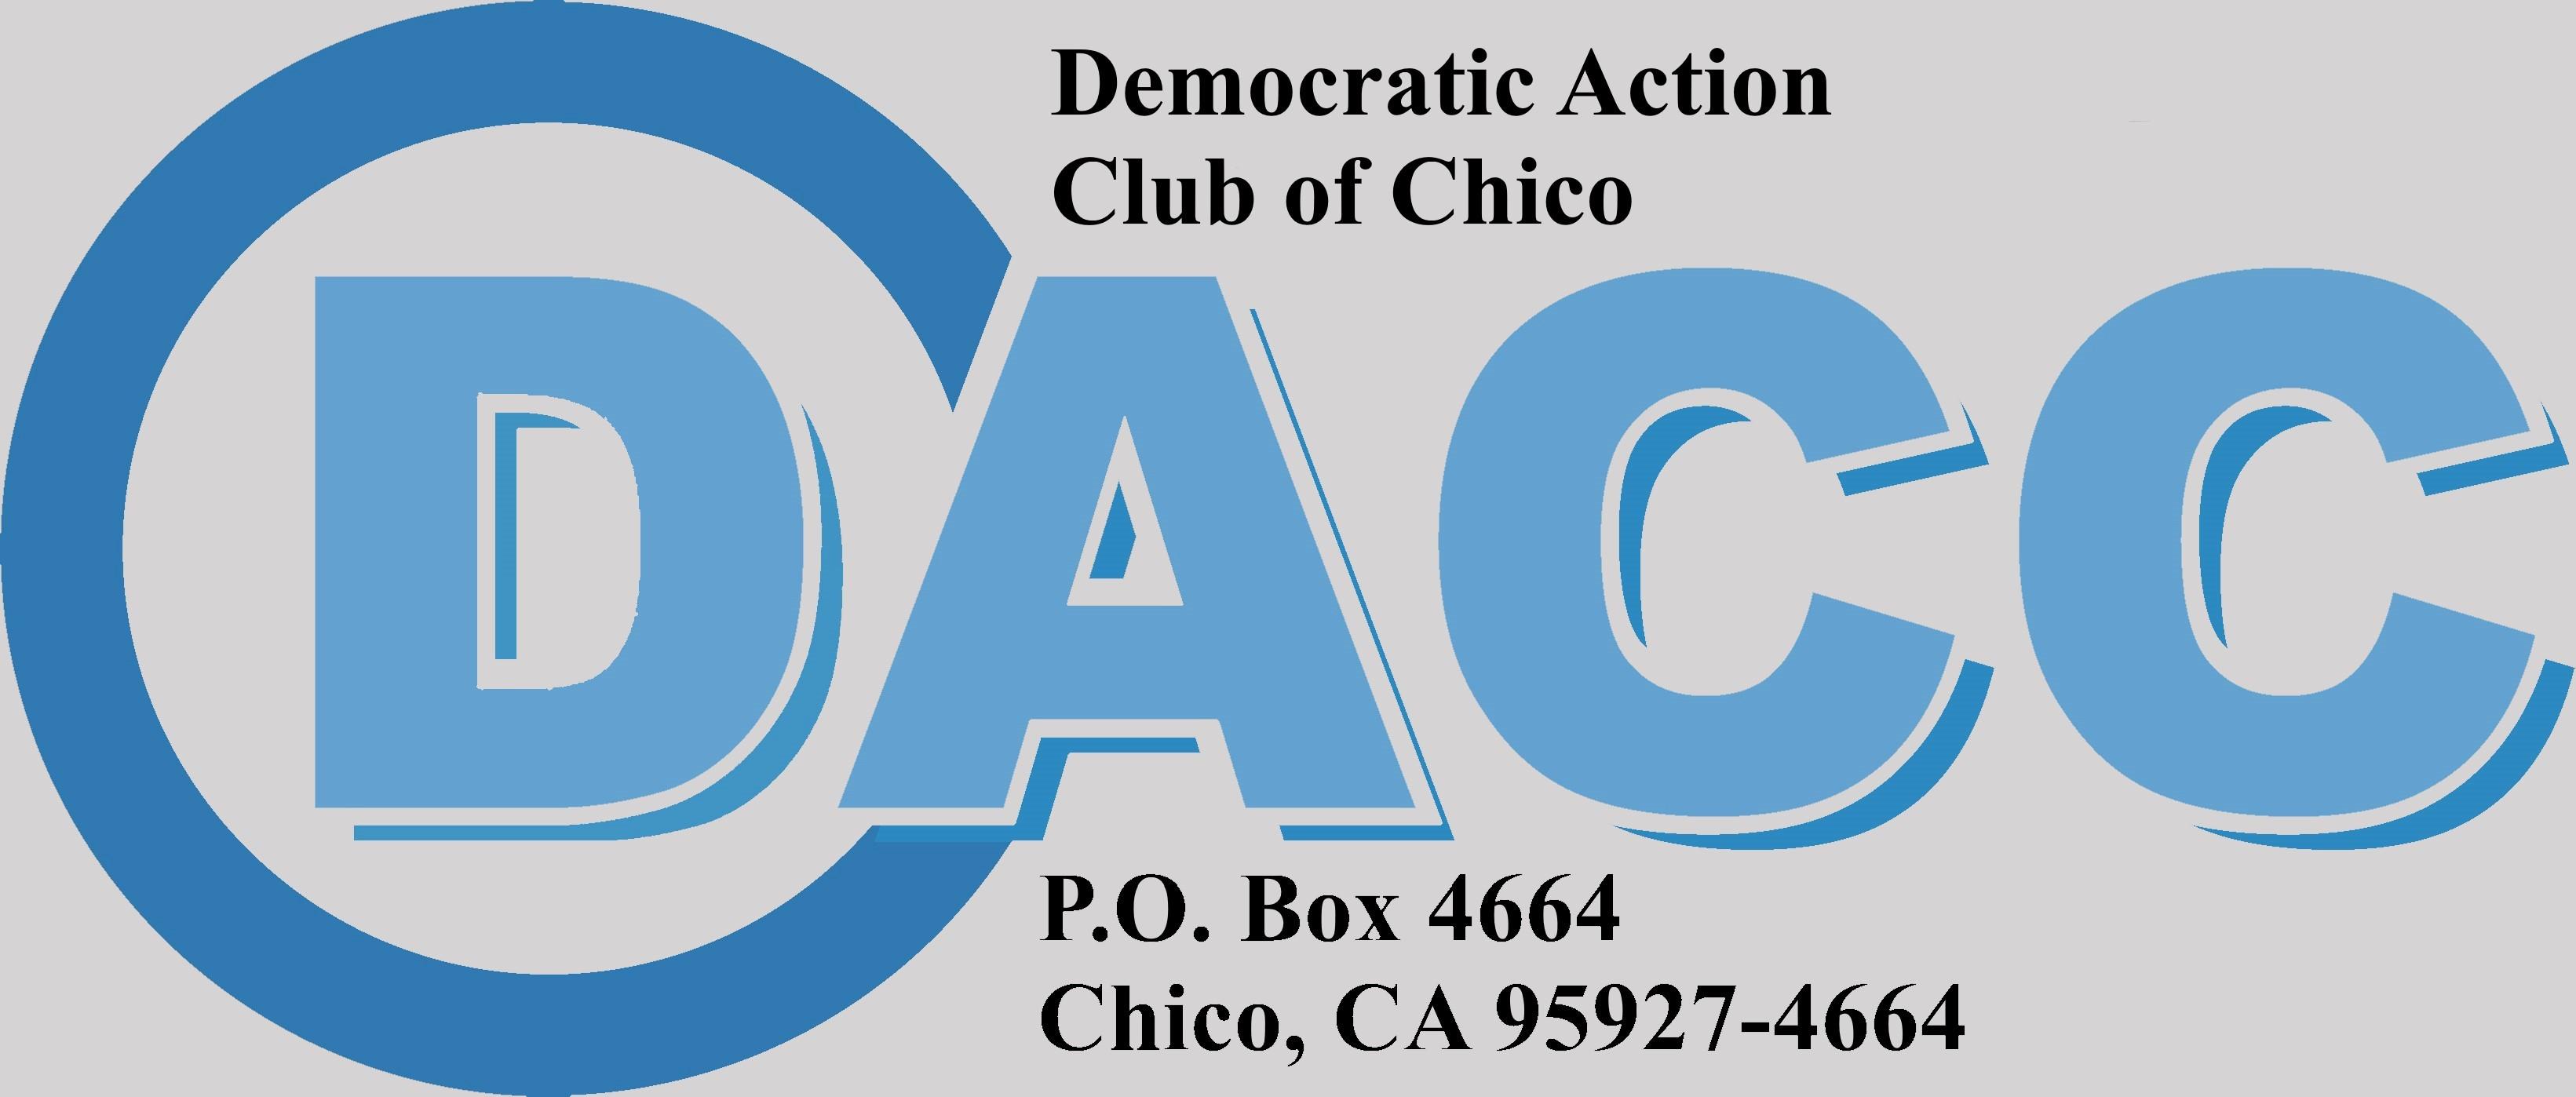 Democratic Action Club of Chico (CA) - Federal